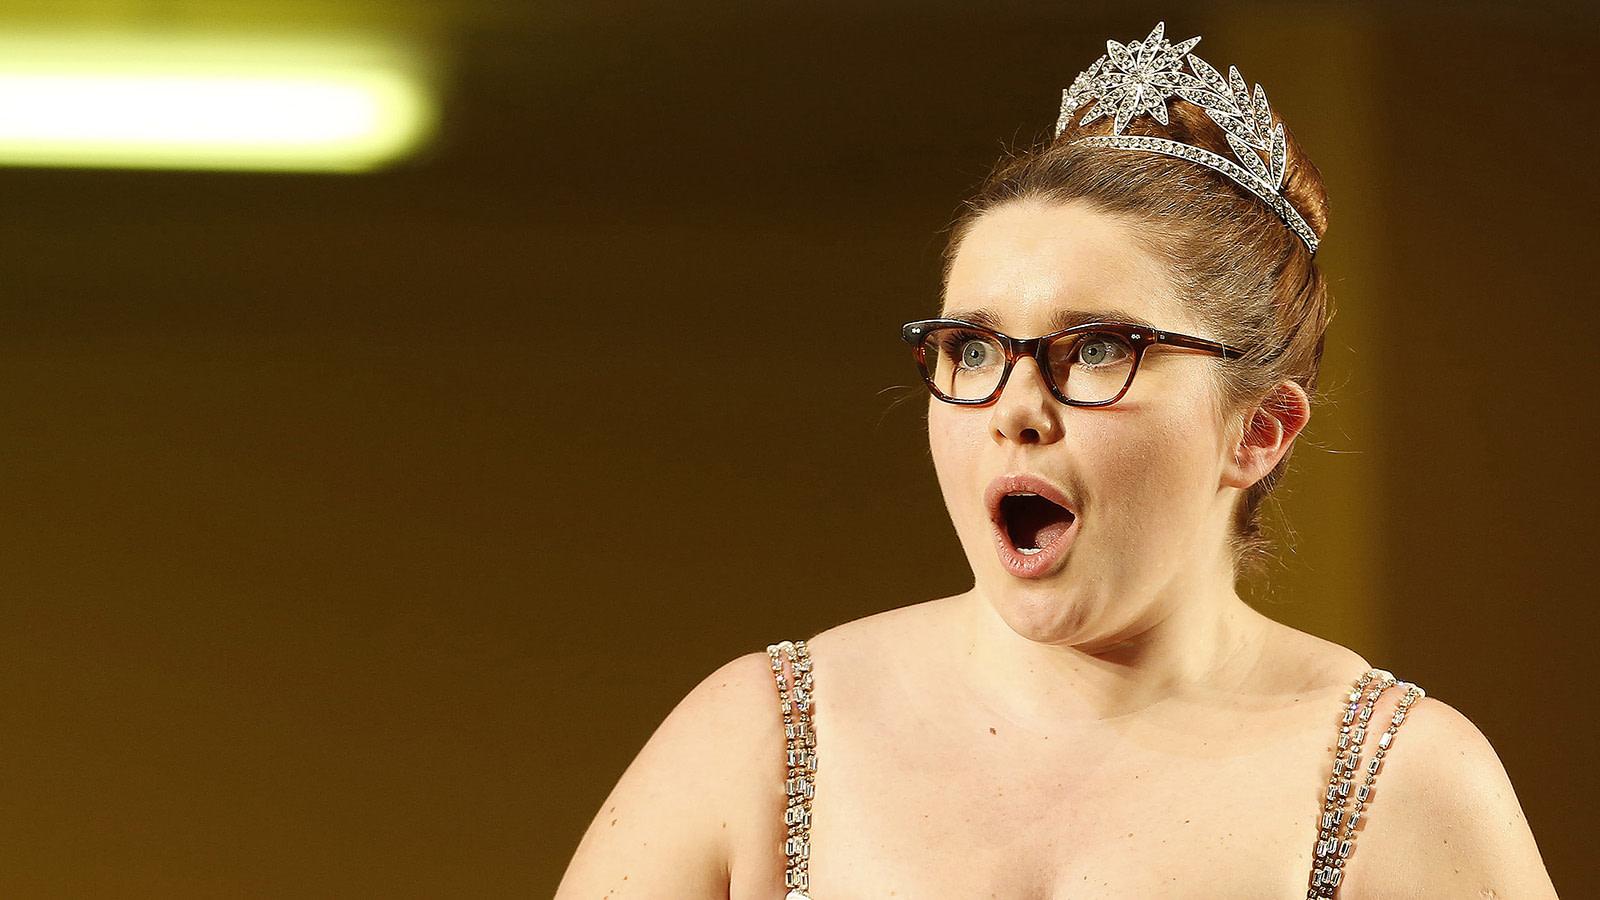 Do Fat People Sing Better Opera?